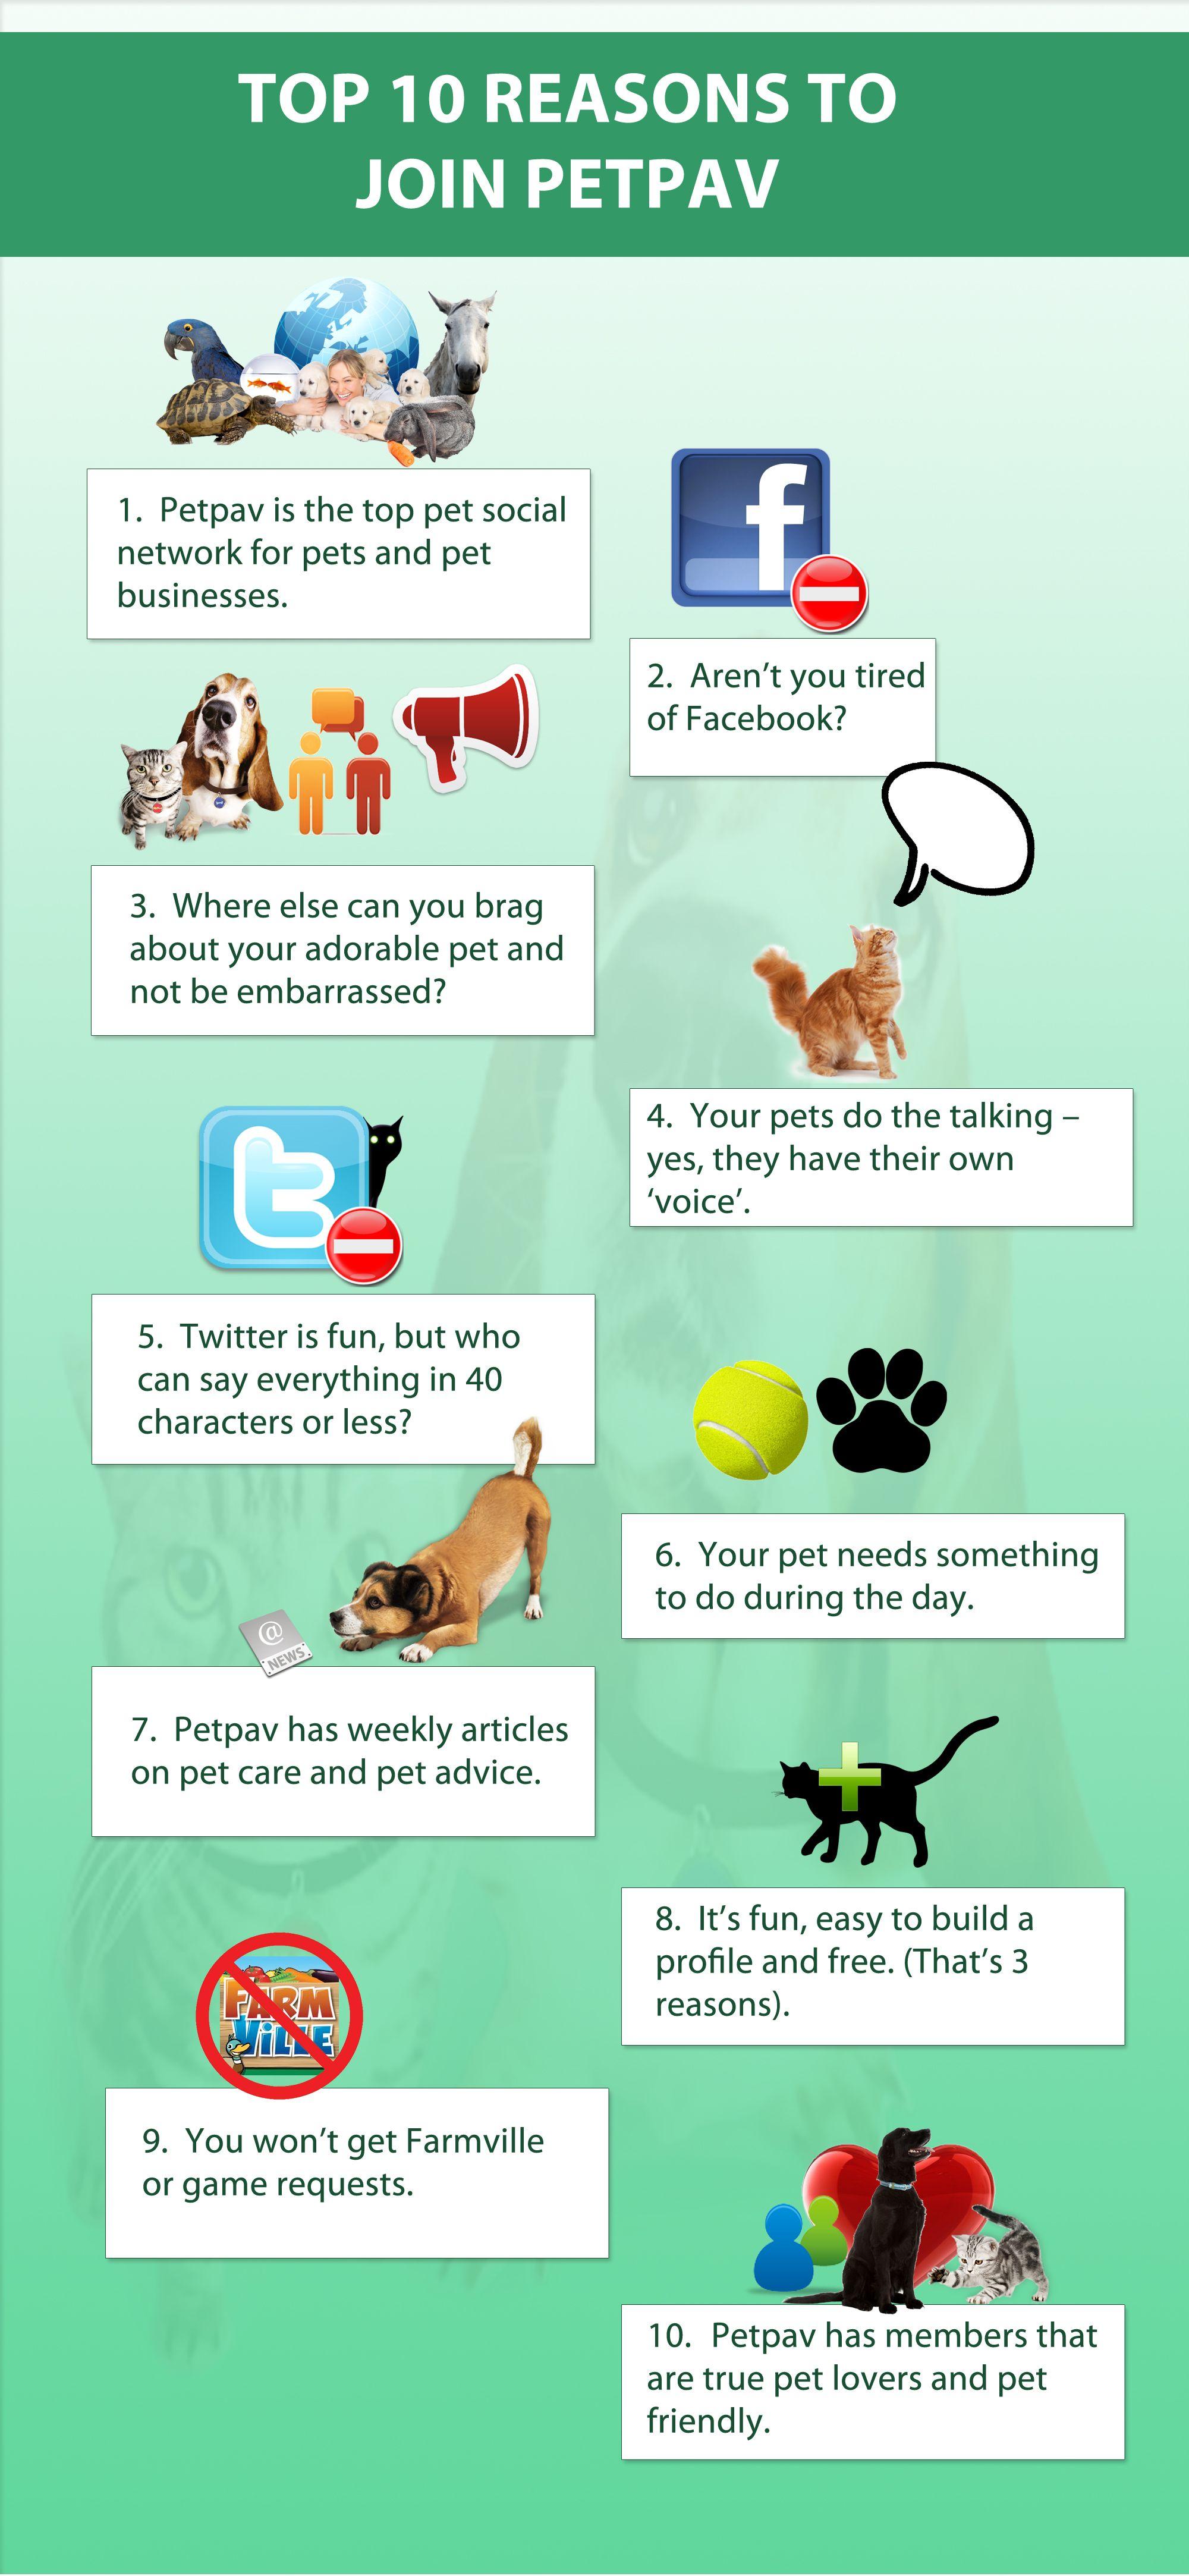 10 Reasons To Join Petpav Http Www Petpav Com Pet News 367 Top 10 Reasons To Join Petpav Pet Businesses Pet News Pets